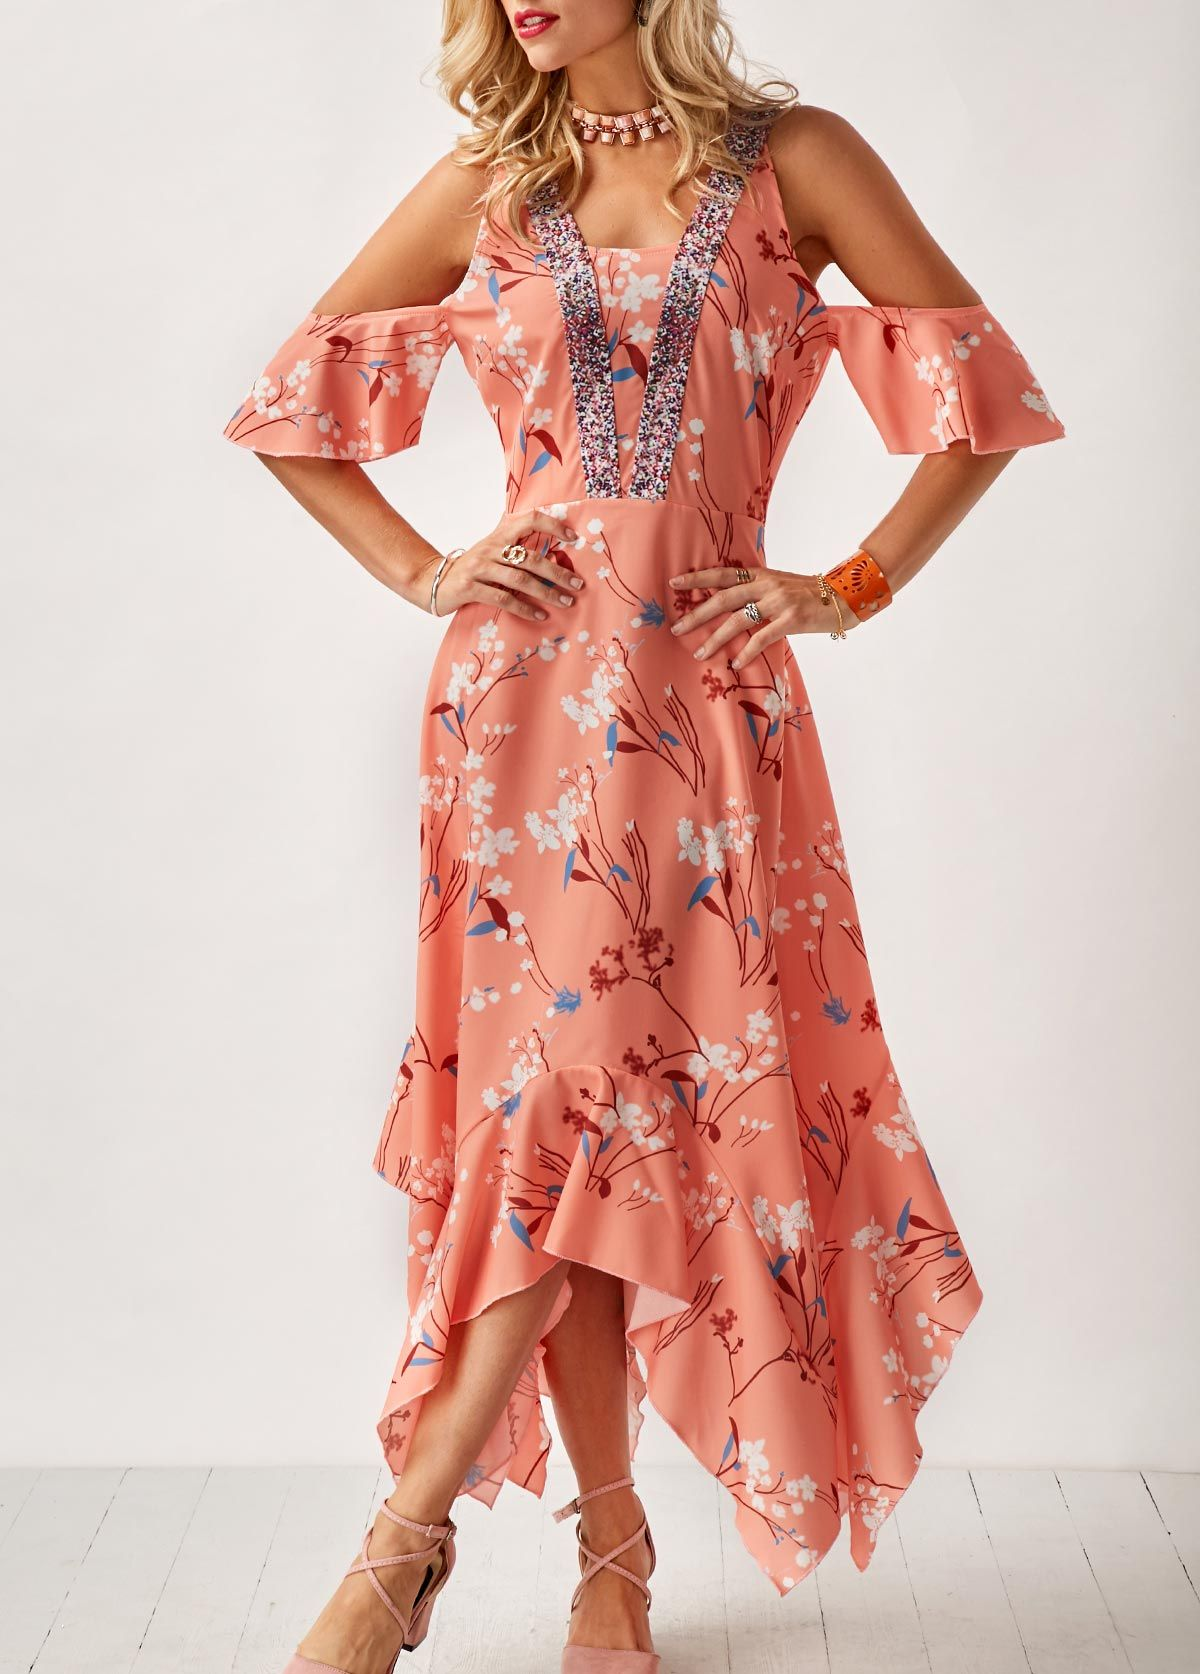 c535a69fa183 Pastel Orange Asymmetric Hem Printed Cold Shoulder Dress on sale only  US 34.90 now